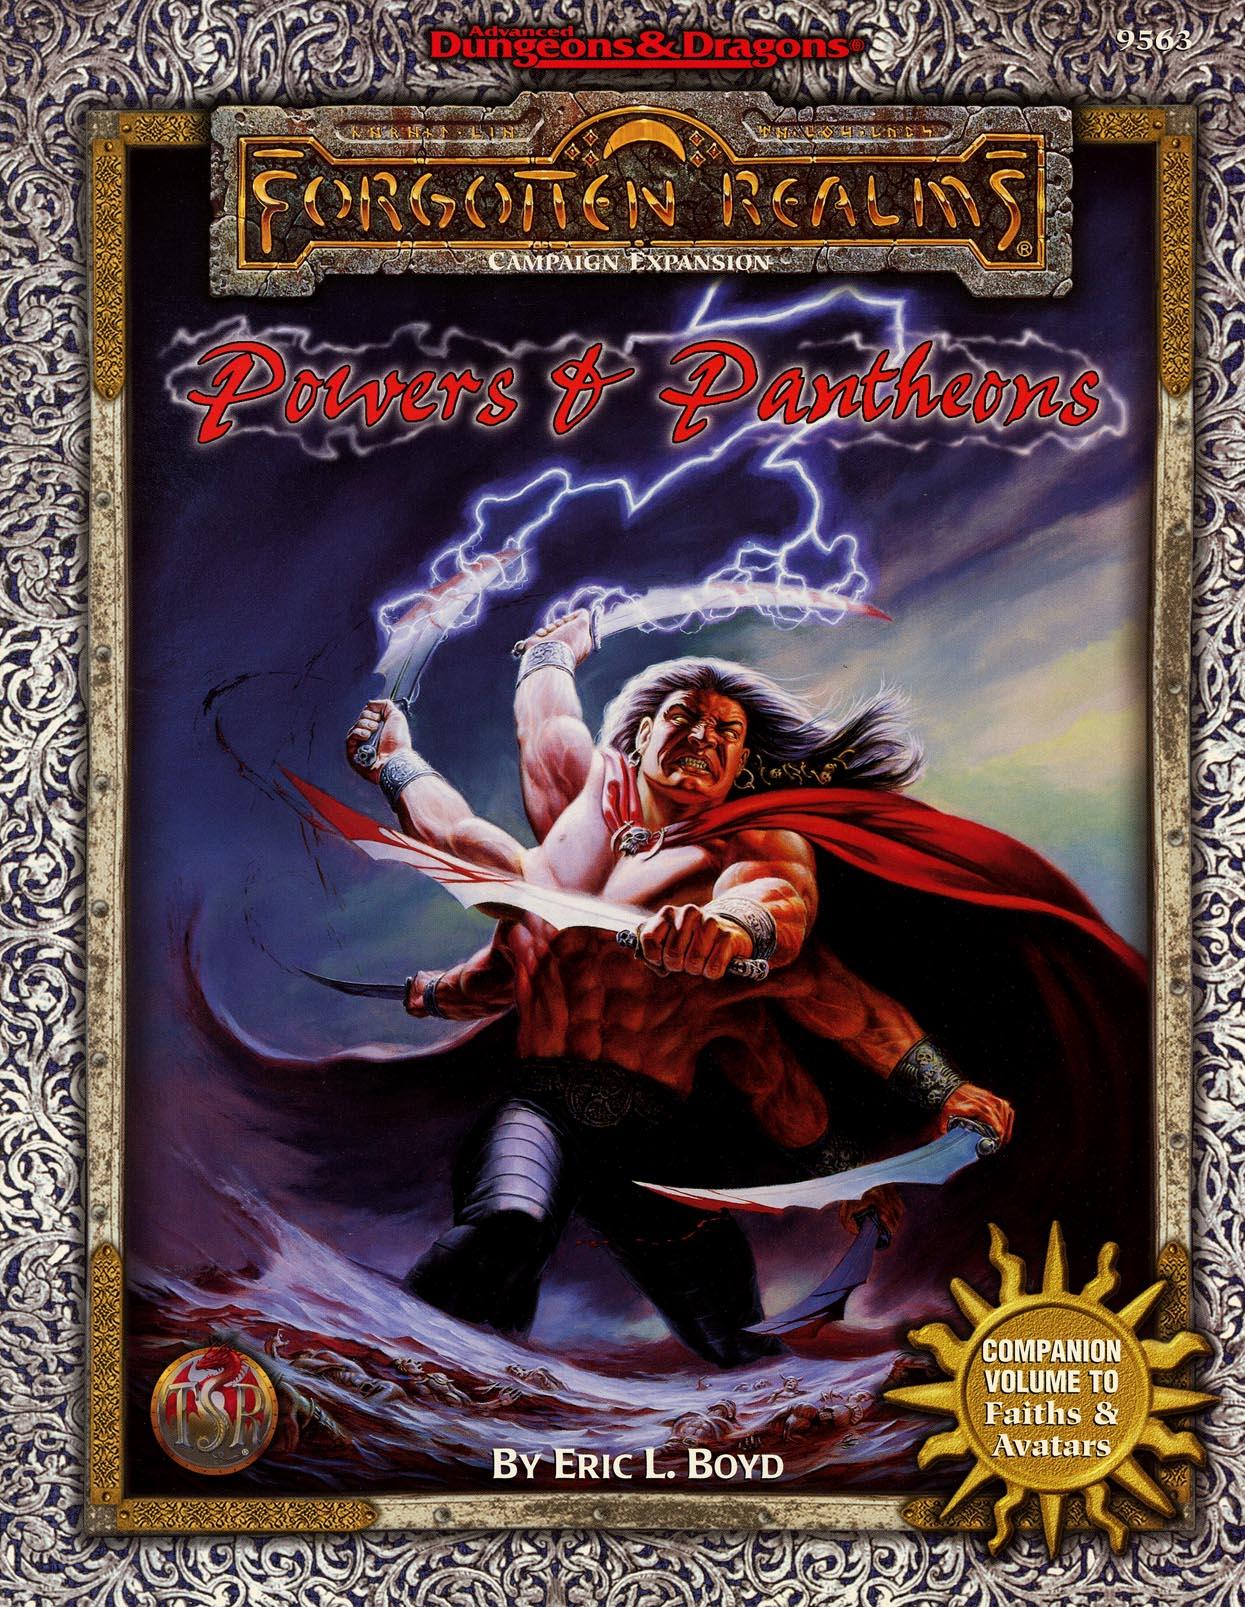 Powers & Pantheons